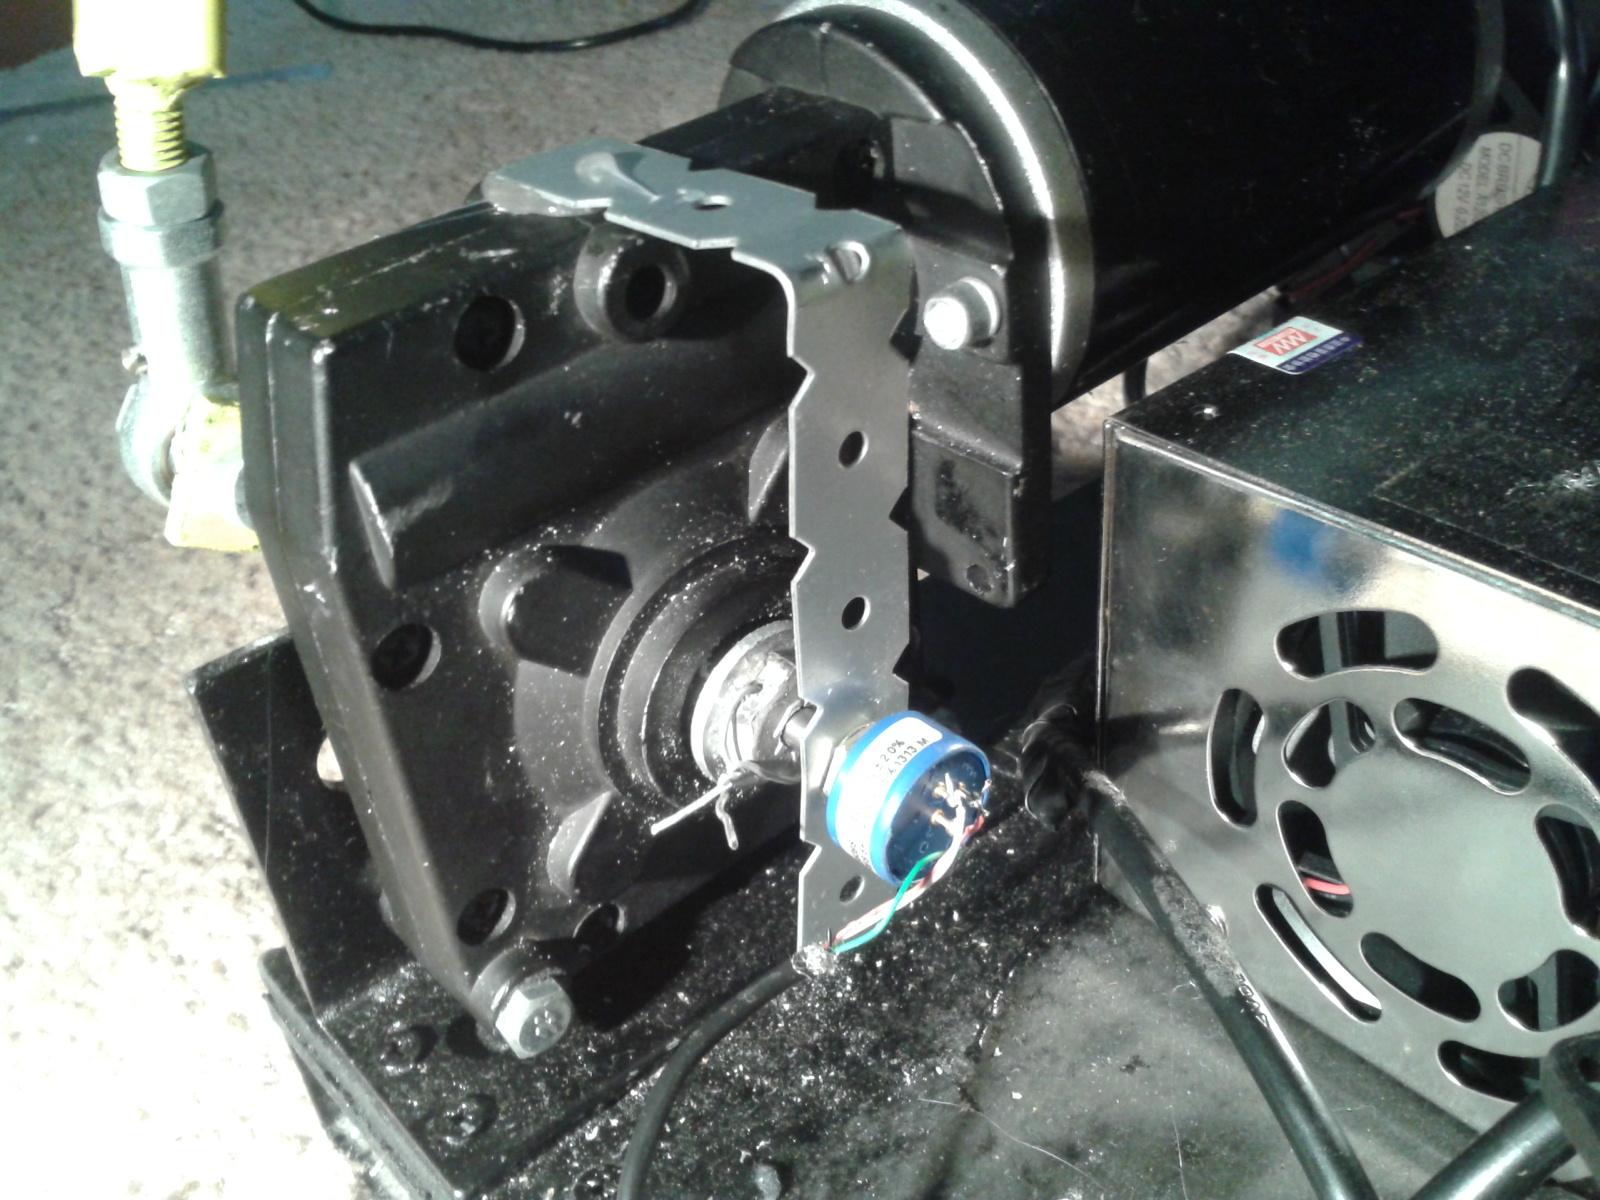 Built Diy 3 Dof Flight Simulator Movement Cockpit Drive Wiring